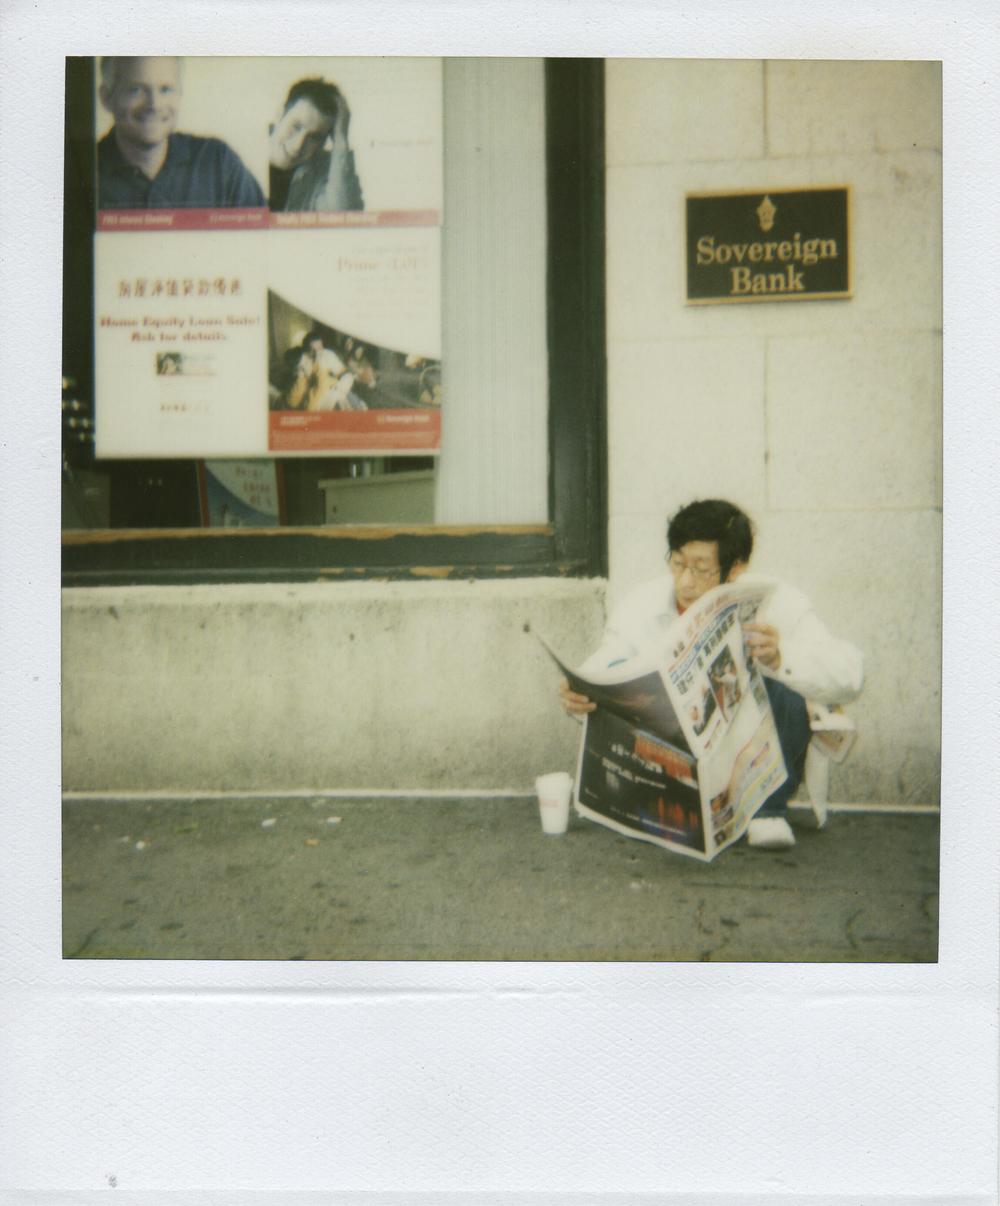 jlaurence-polaroid-002.jpg